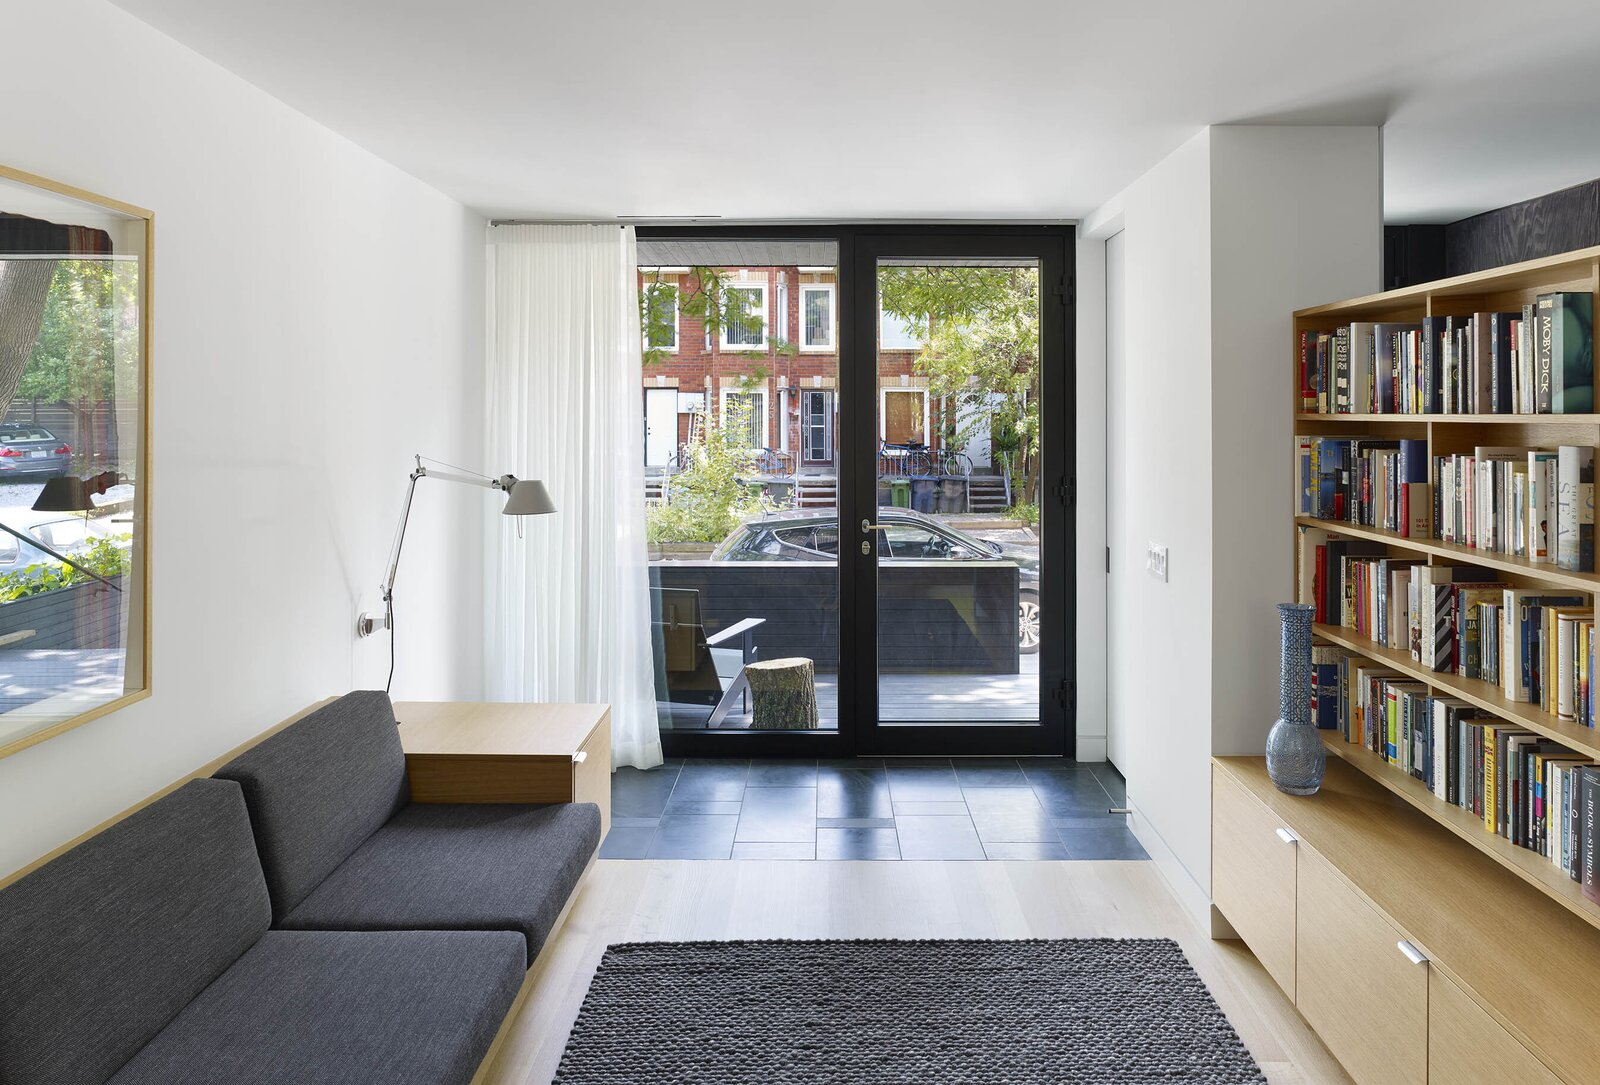 Living Room, Rug Floor, Light Hardwood Floor, Wall Lighting, Shelves, Sofa, and Storage  Bellwoods Lodge